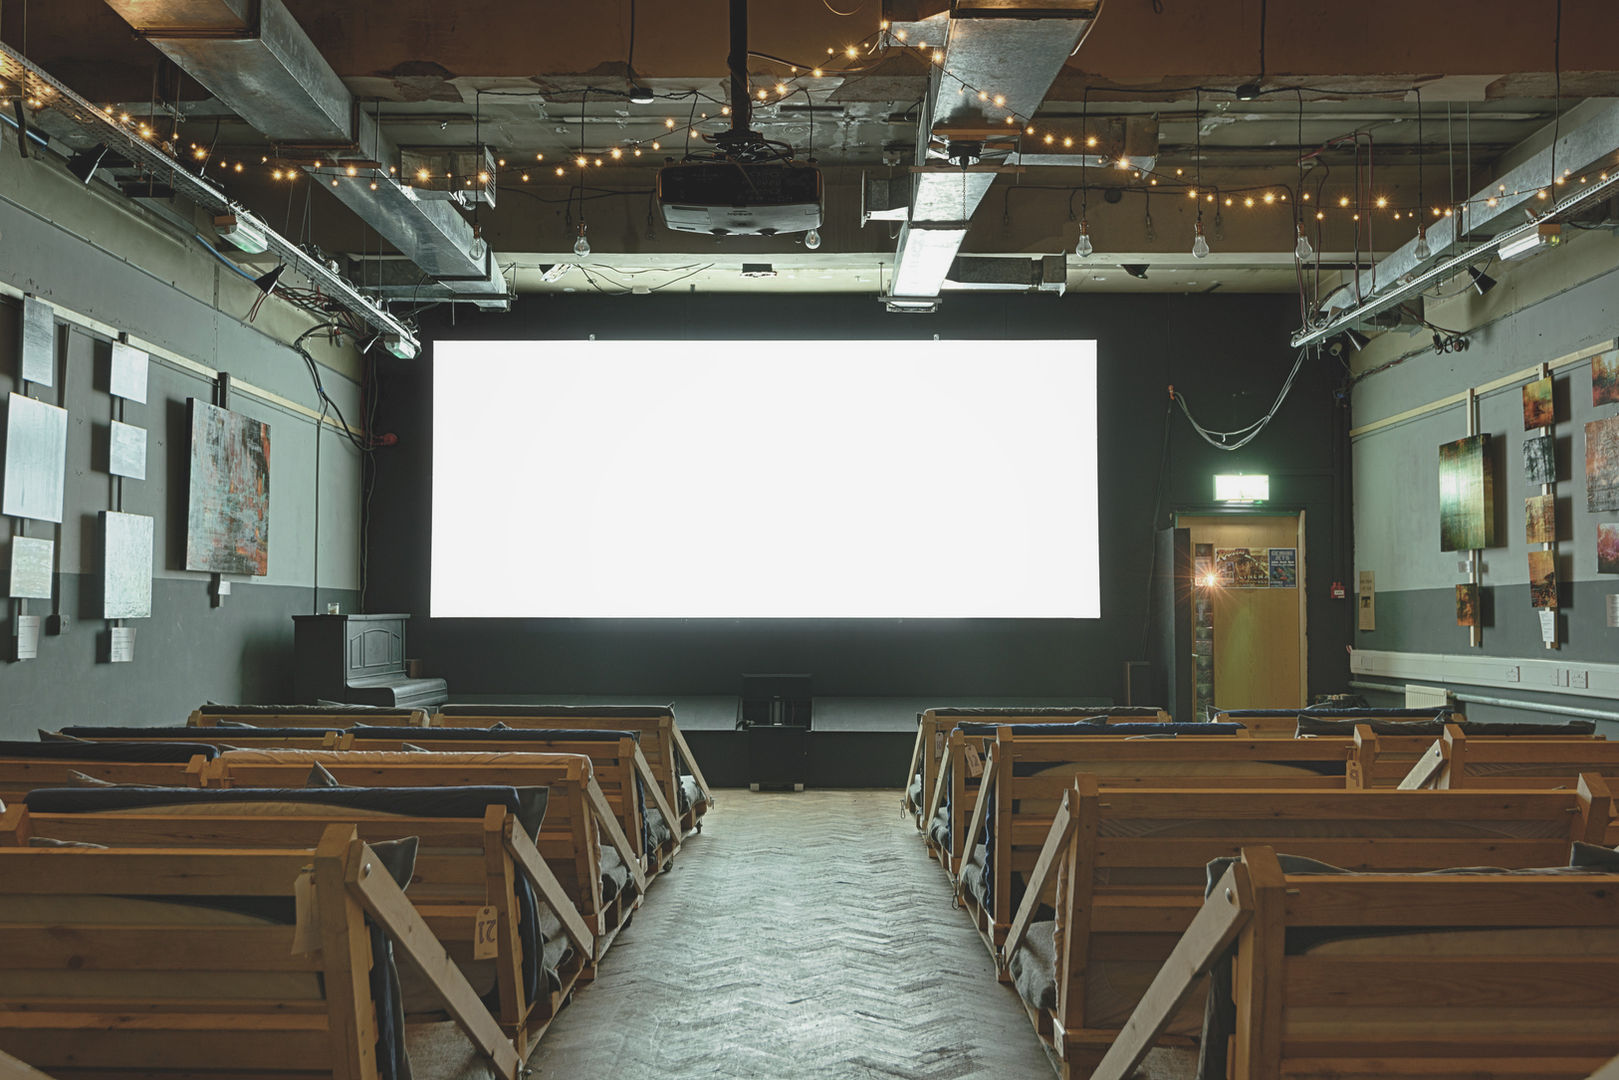 Cinema faded 1.jpg